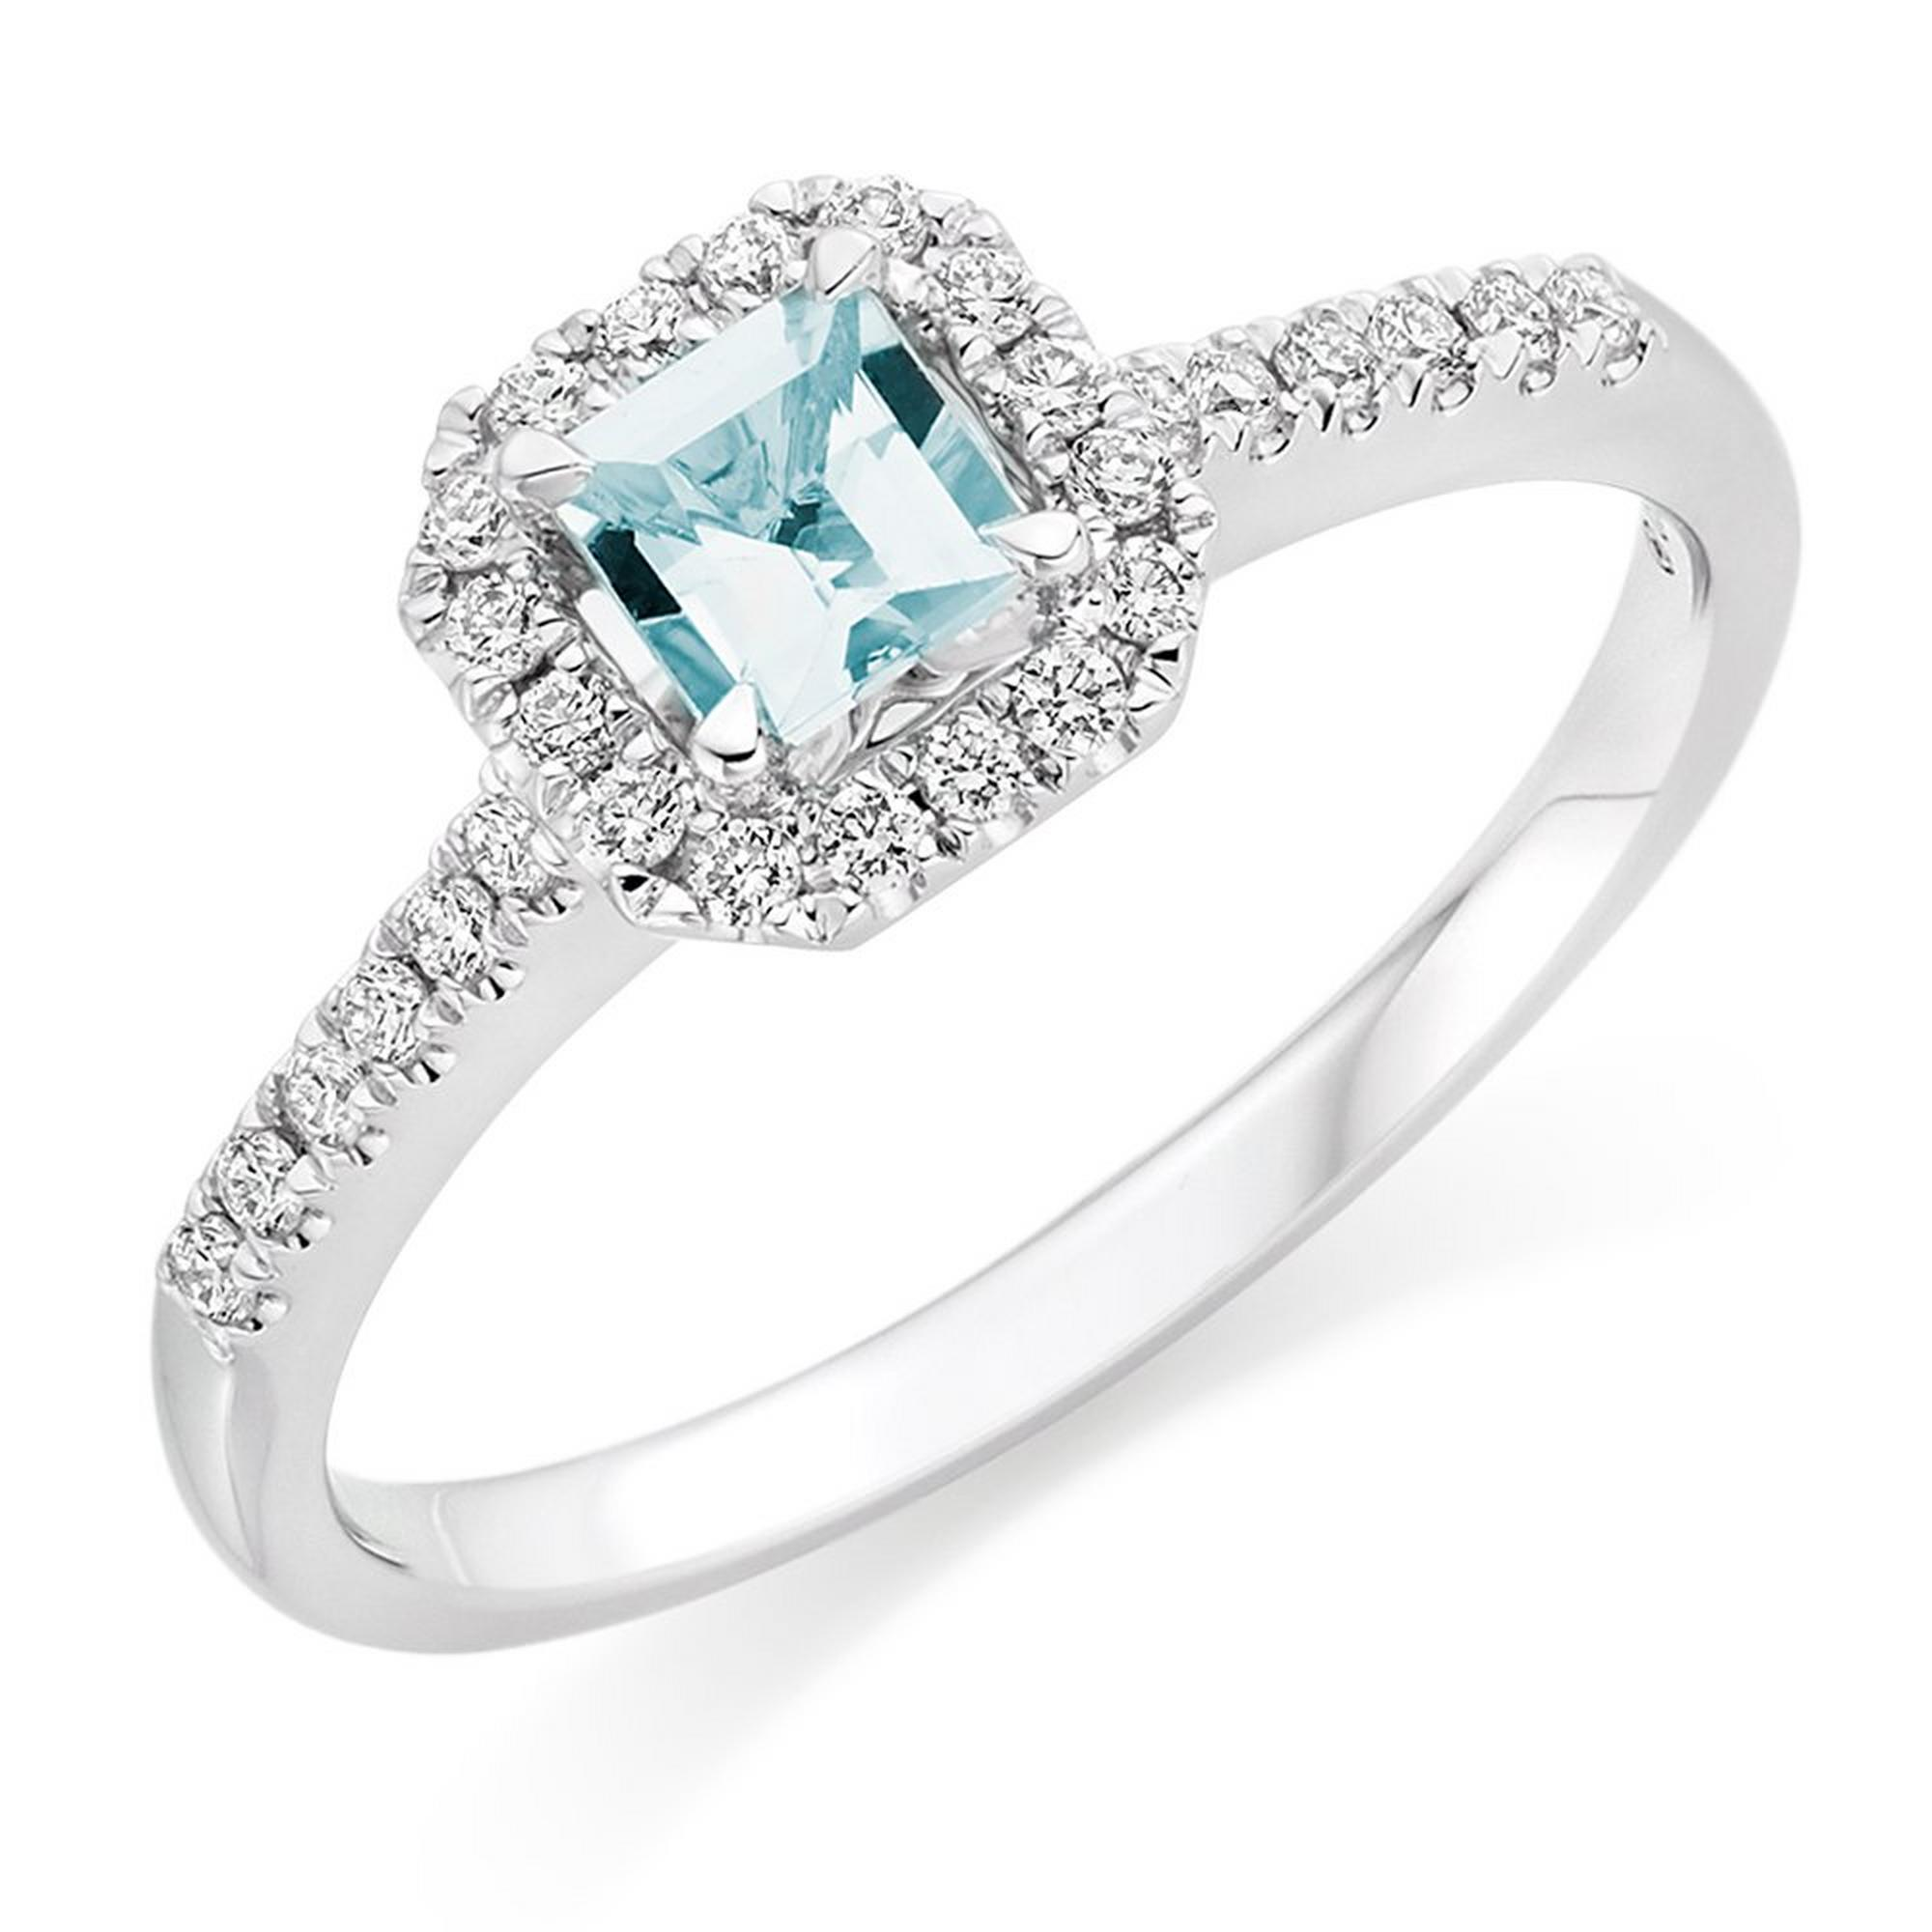 18ct White Gold Diamond Aquamarine Halo Ring